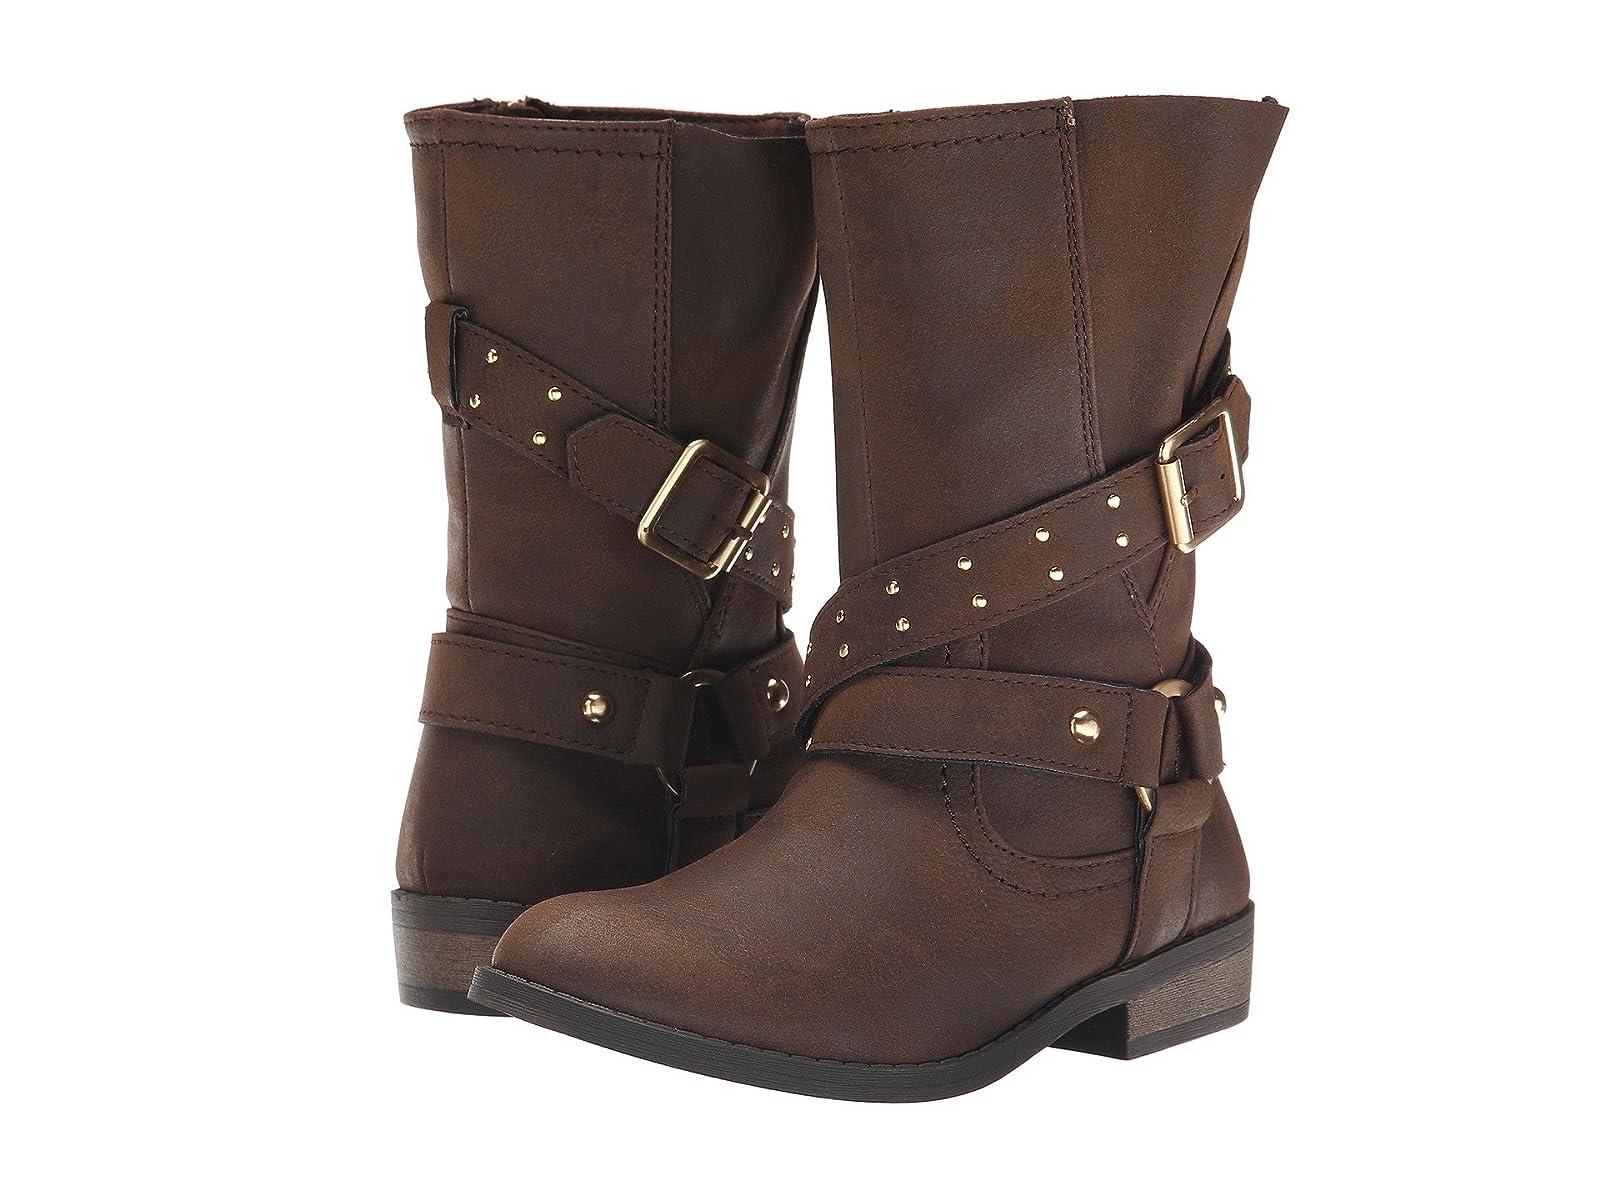 Jessica Simpson Kids Callie (Little Kid/Big Kid)Cheap and distinctive eye-catching shoes